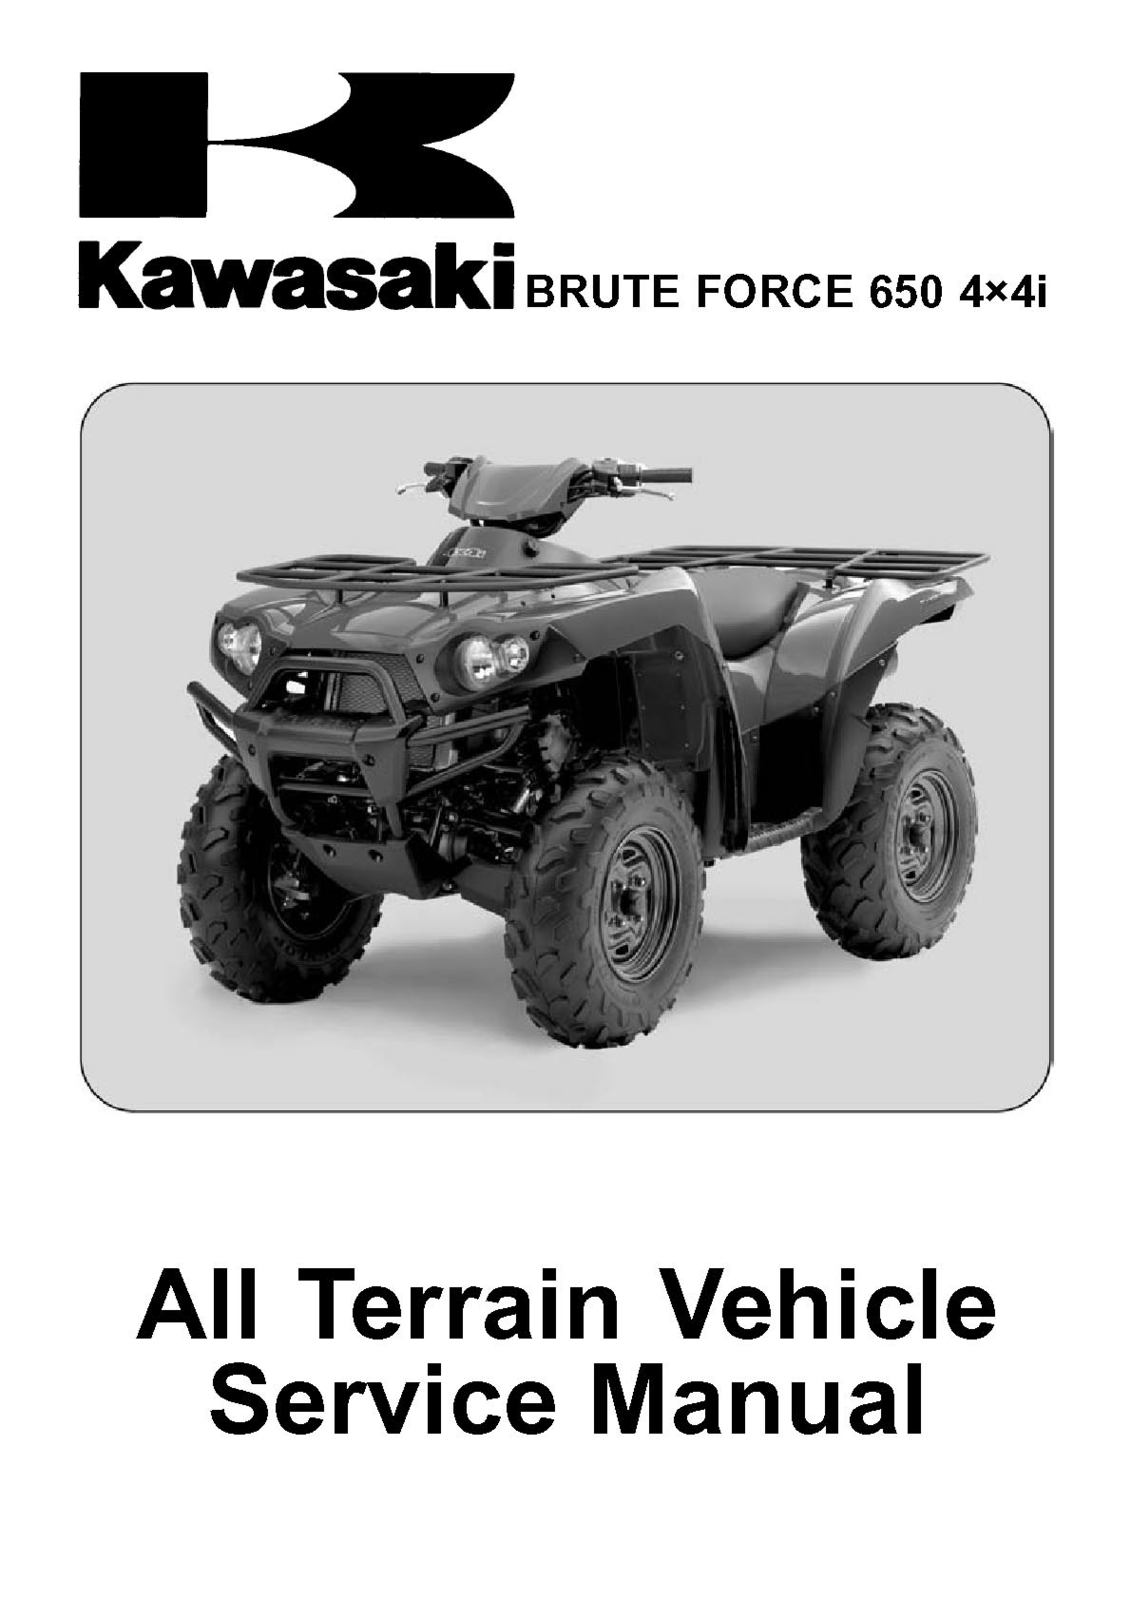 2006 2007 kawasaki kvf650 kvf brute force 650 4x4i shop. Black Bedroom Furniture Sets. Home Design Ideas